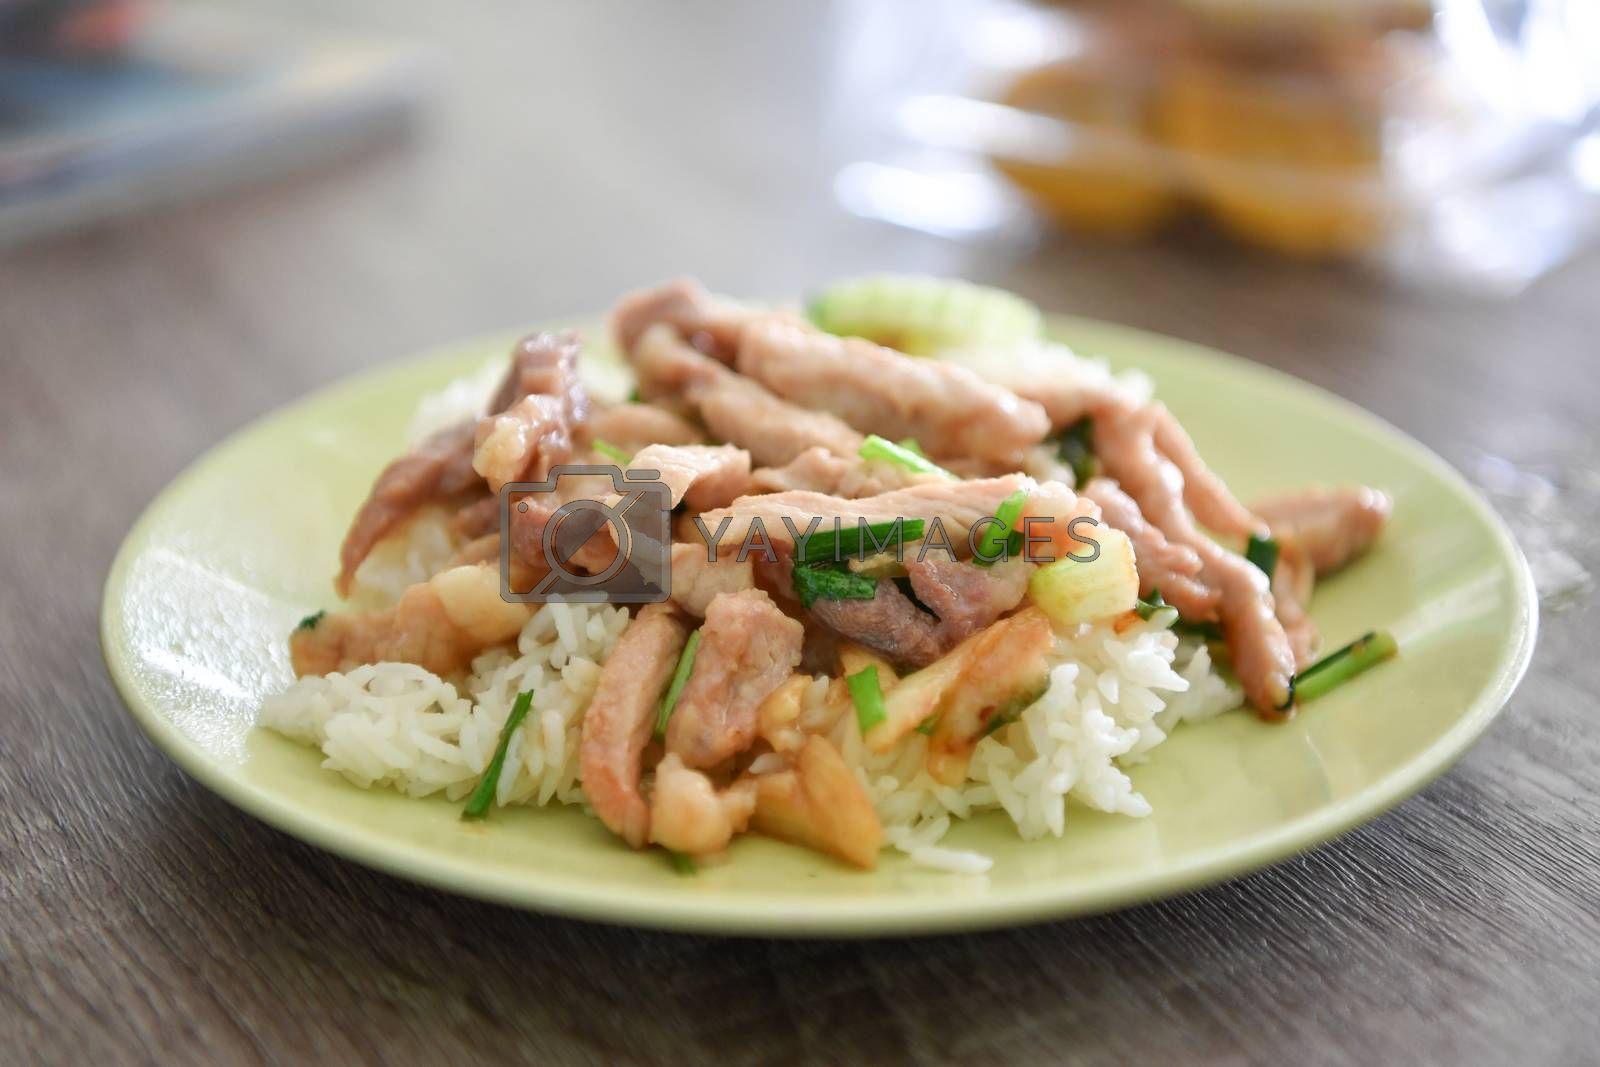 Fried Pork with Garlic Pepper on Rice, Thai food.